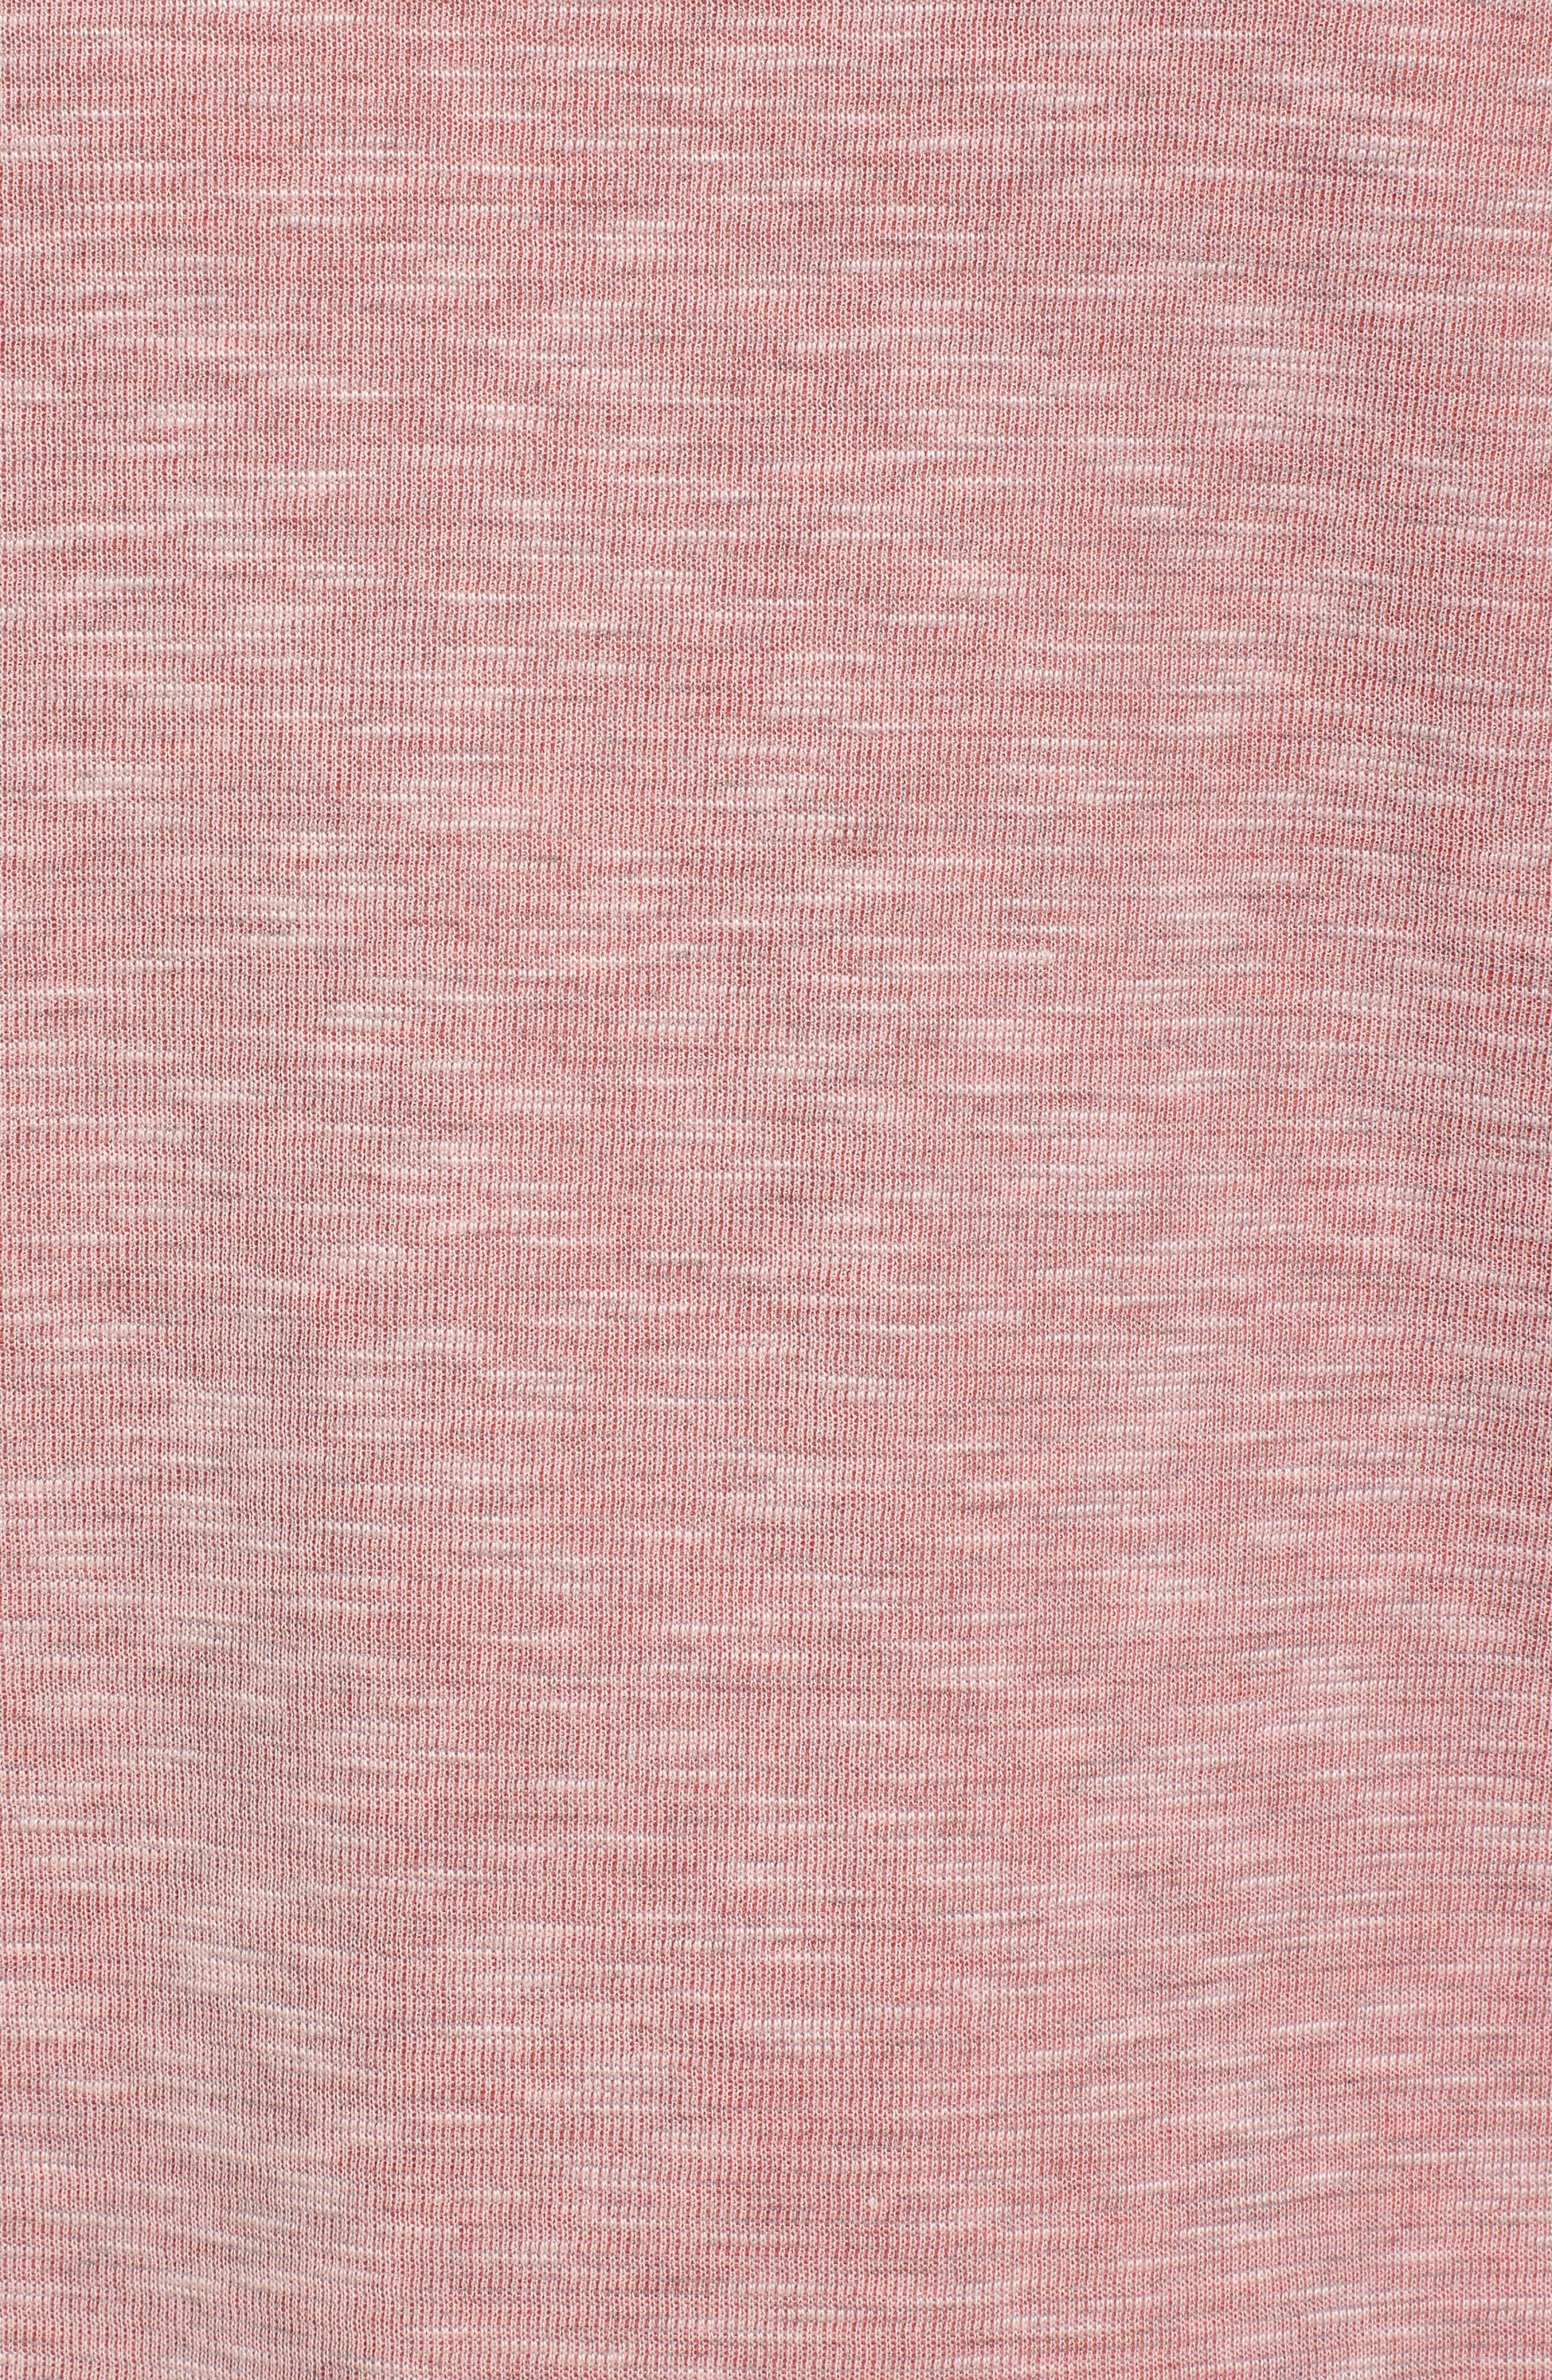 Flip Tide T-Shirt,                             Alternate thumbnail 48, color,